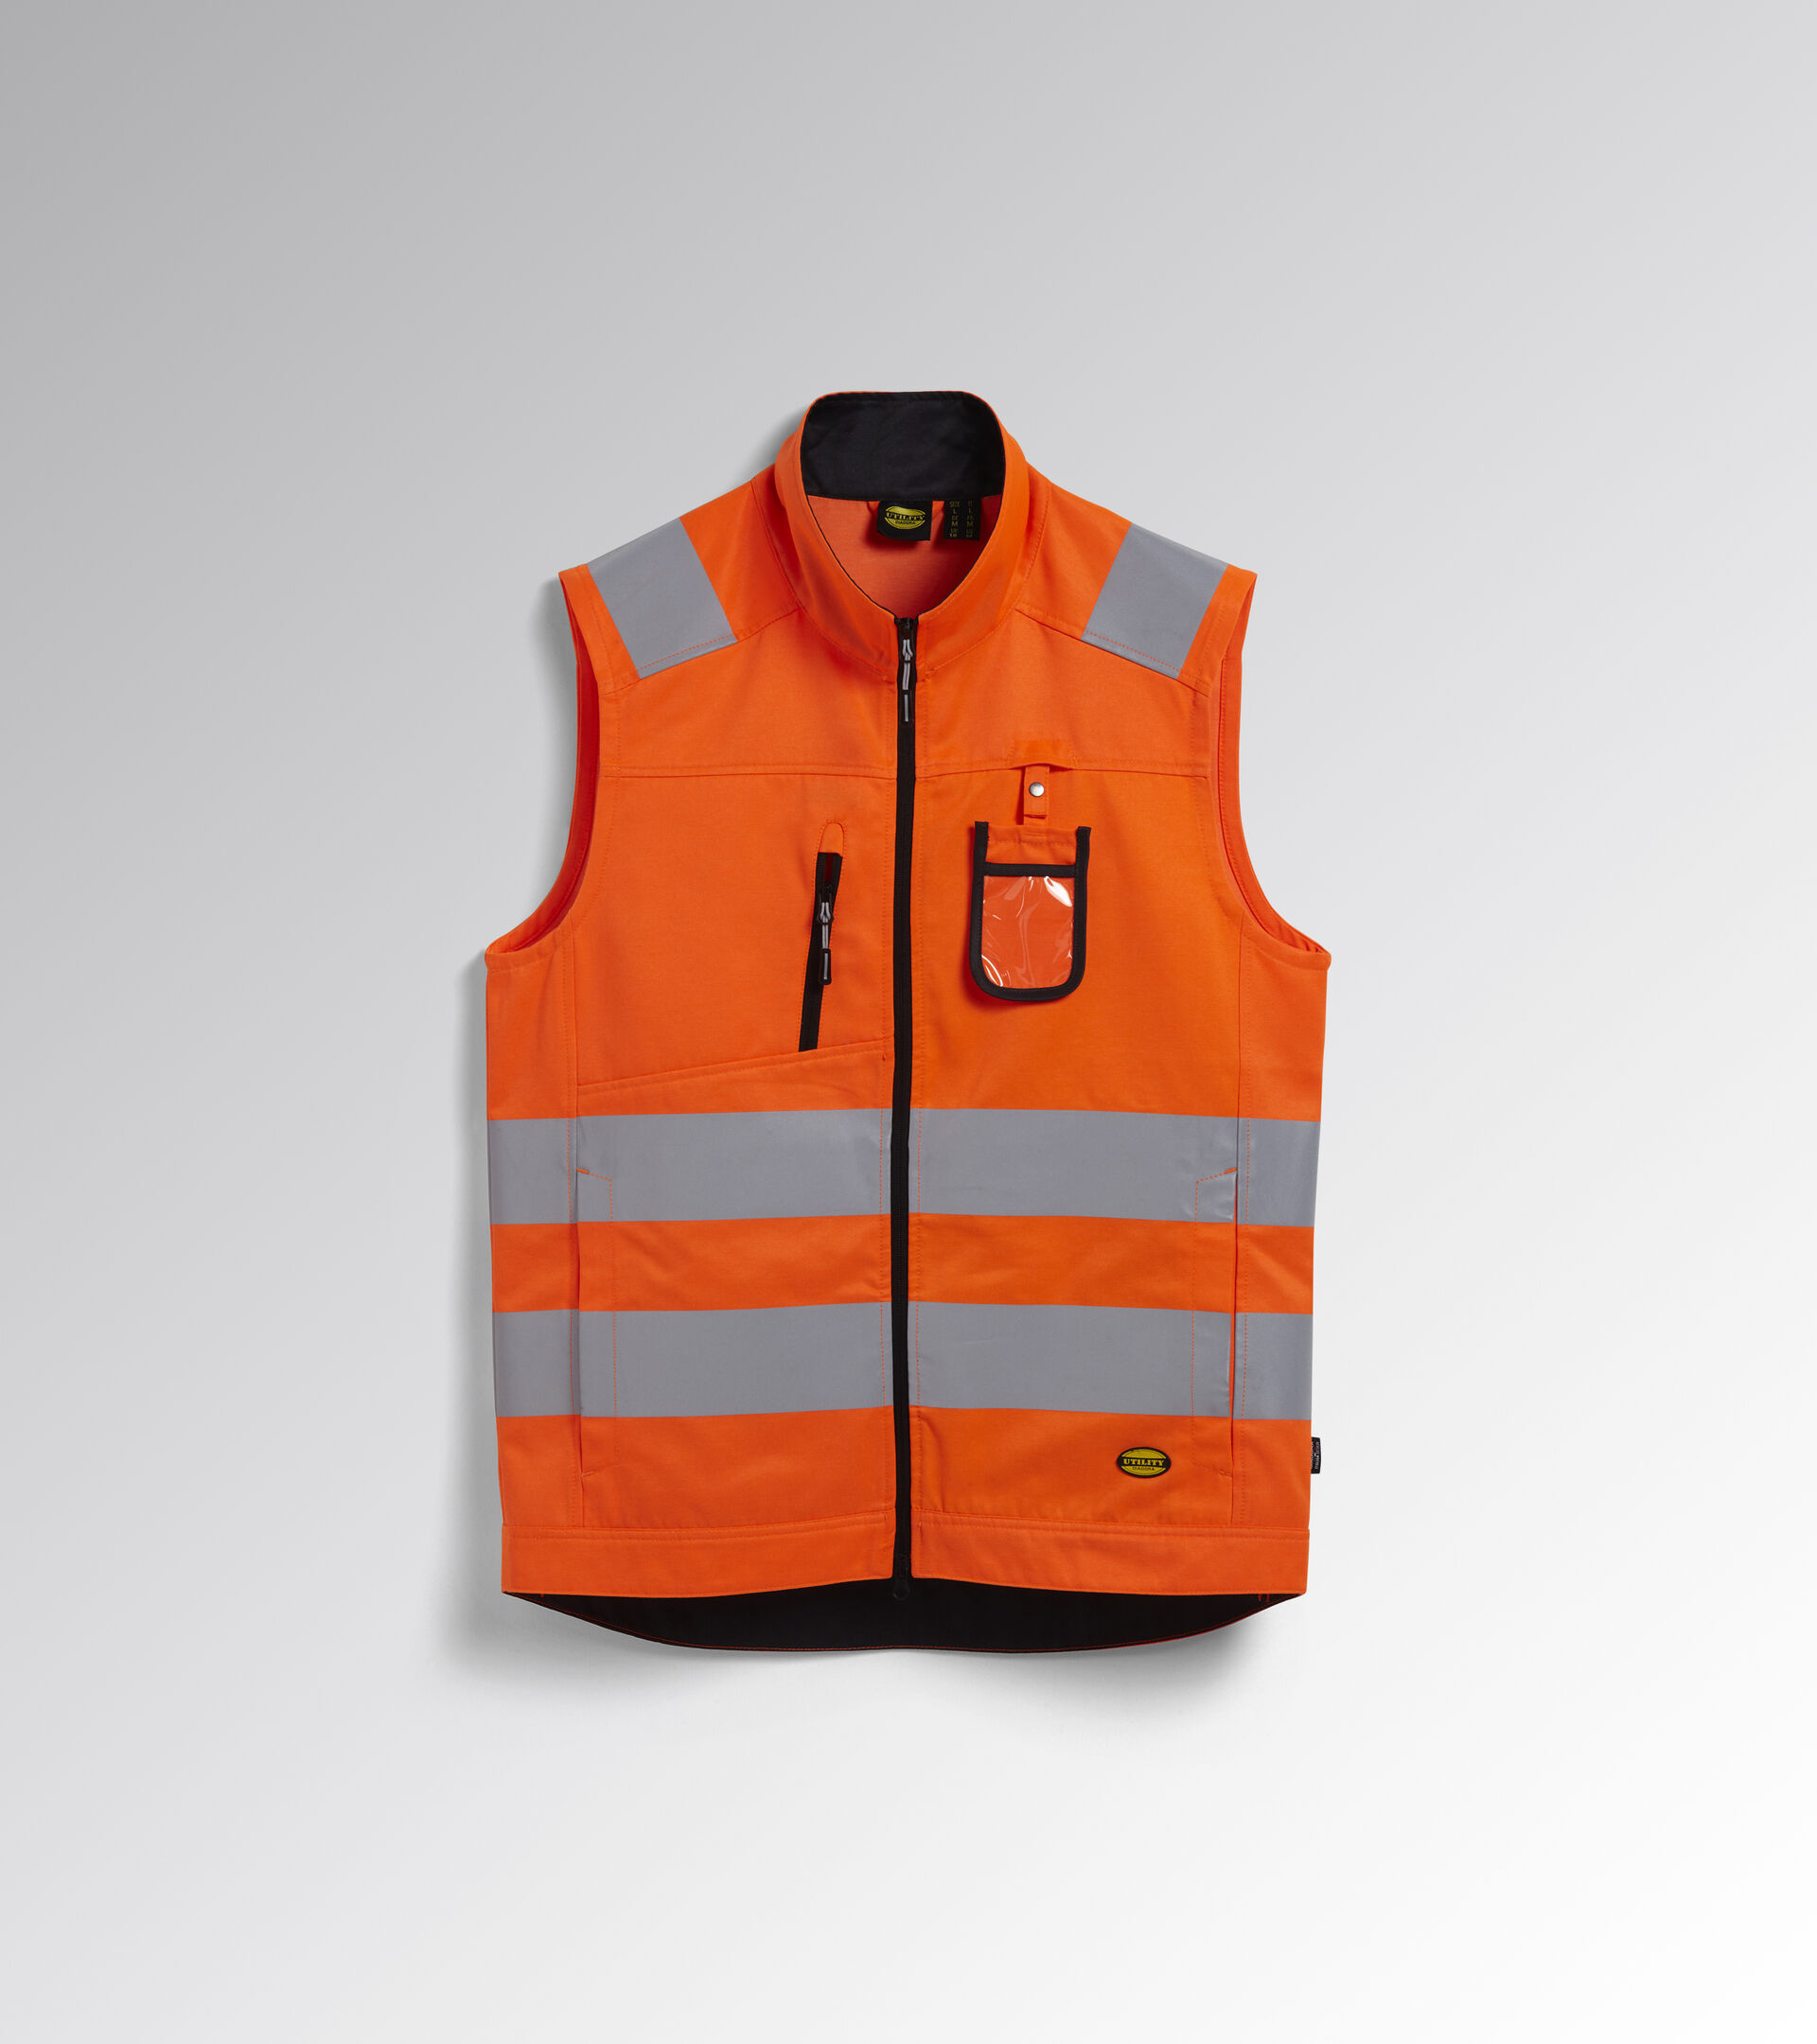 Apparel Utility UOMO HV VEST ISO 20471 FLUORESCENT ORANGE ISO20471 Utility